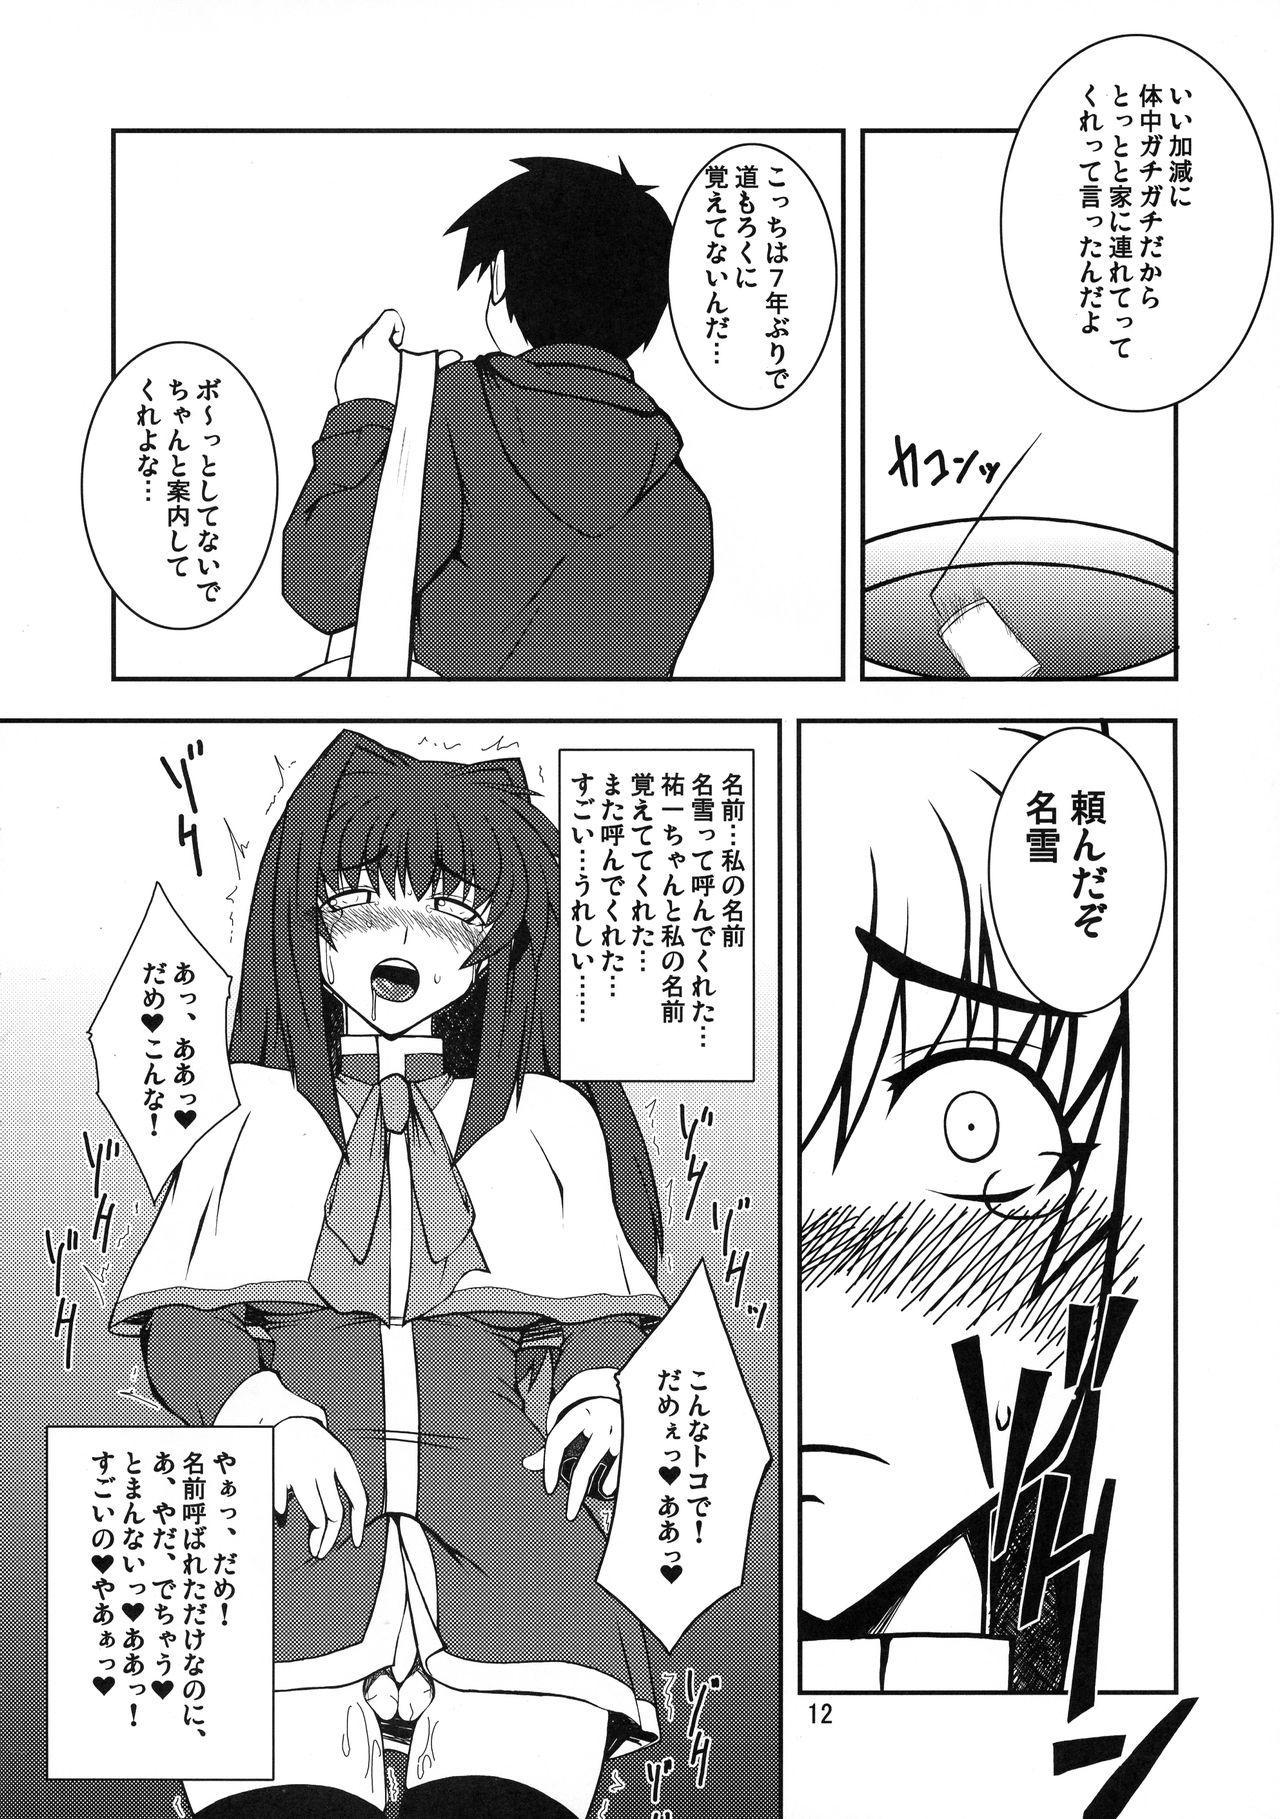 Kyouki Vol. 3~5 Remake Ver. 11